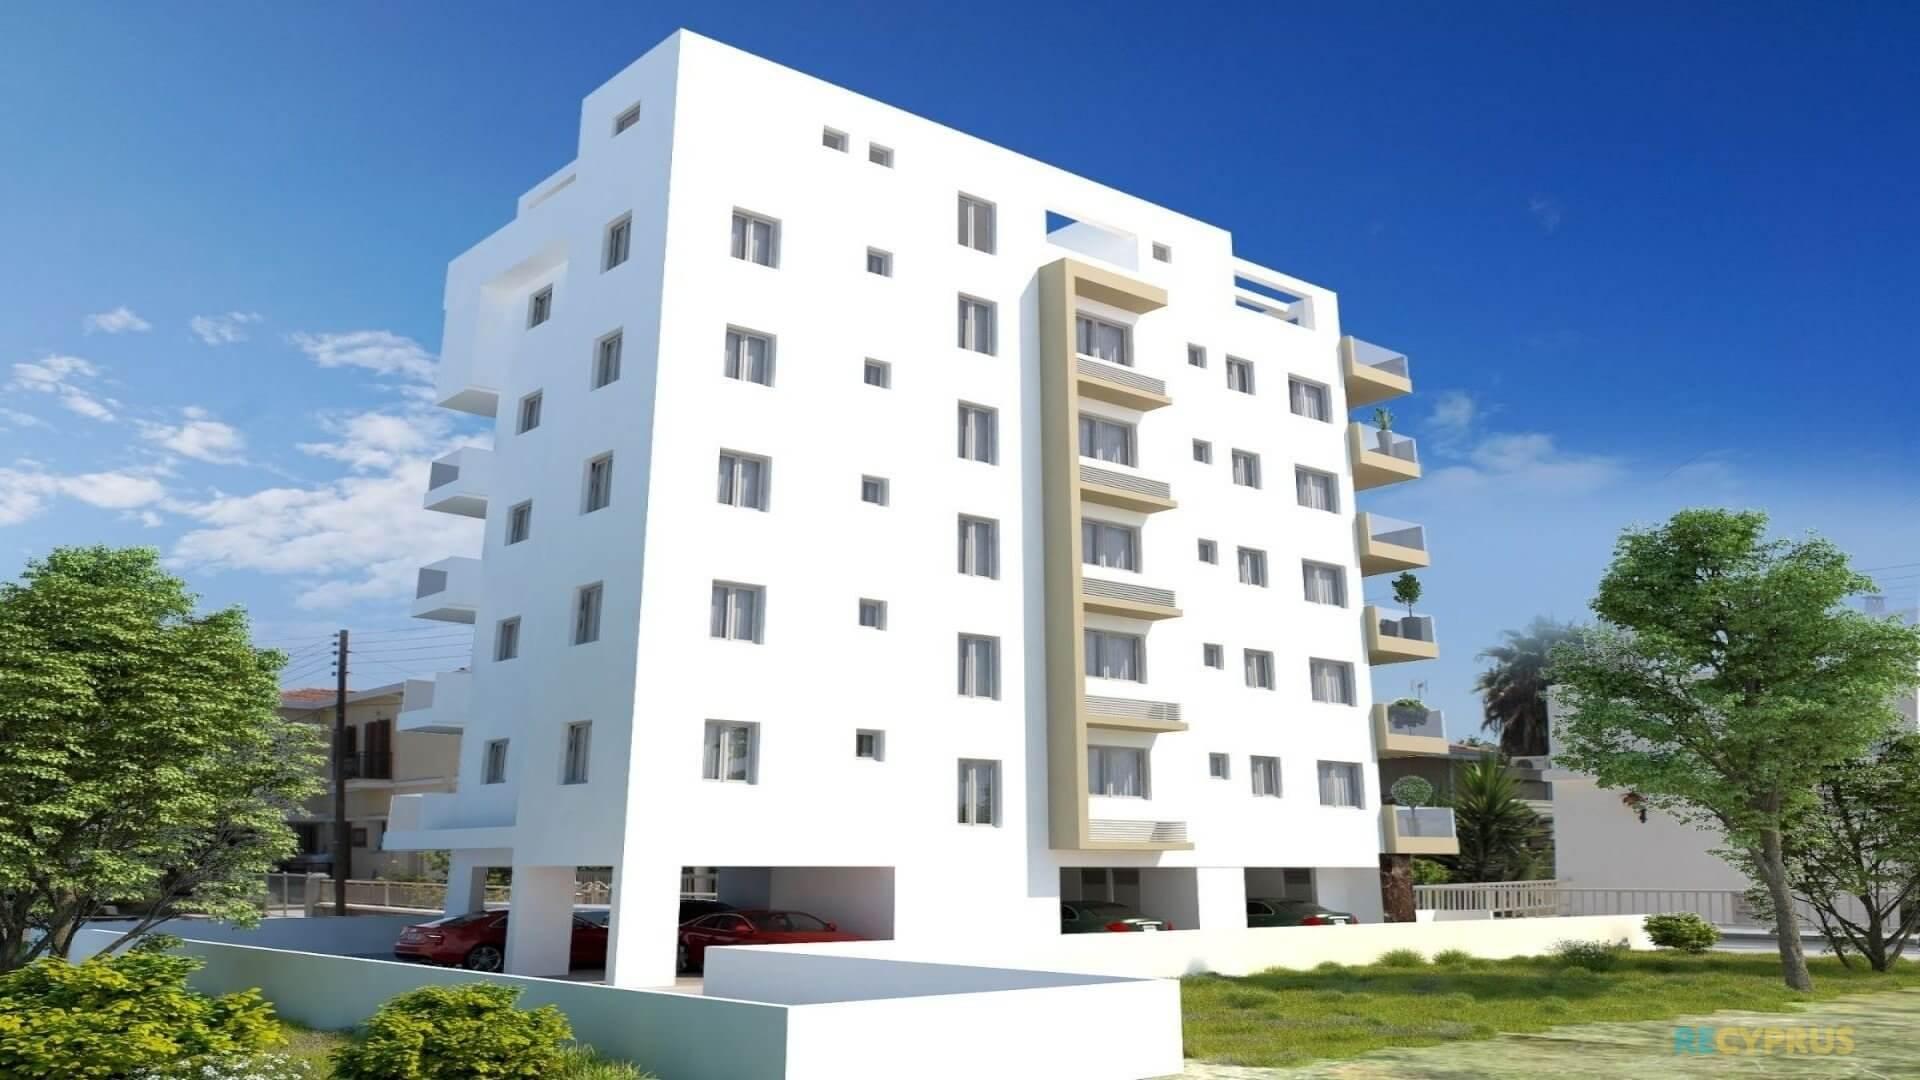 Apartment for sale City Center Larnaca Cyprus 1 3596